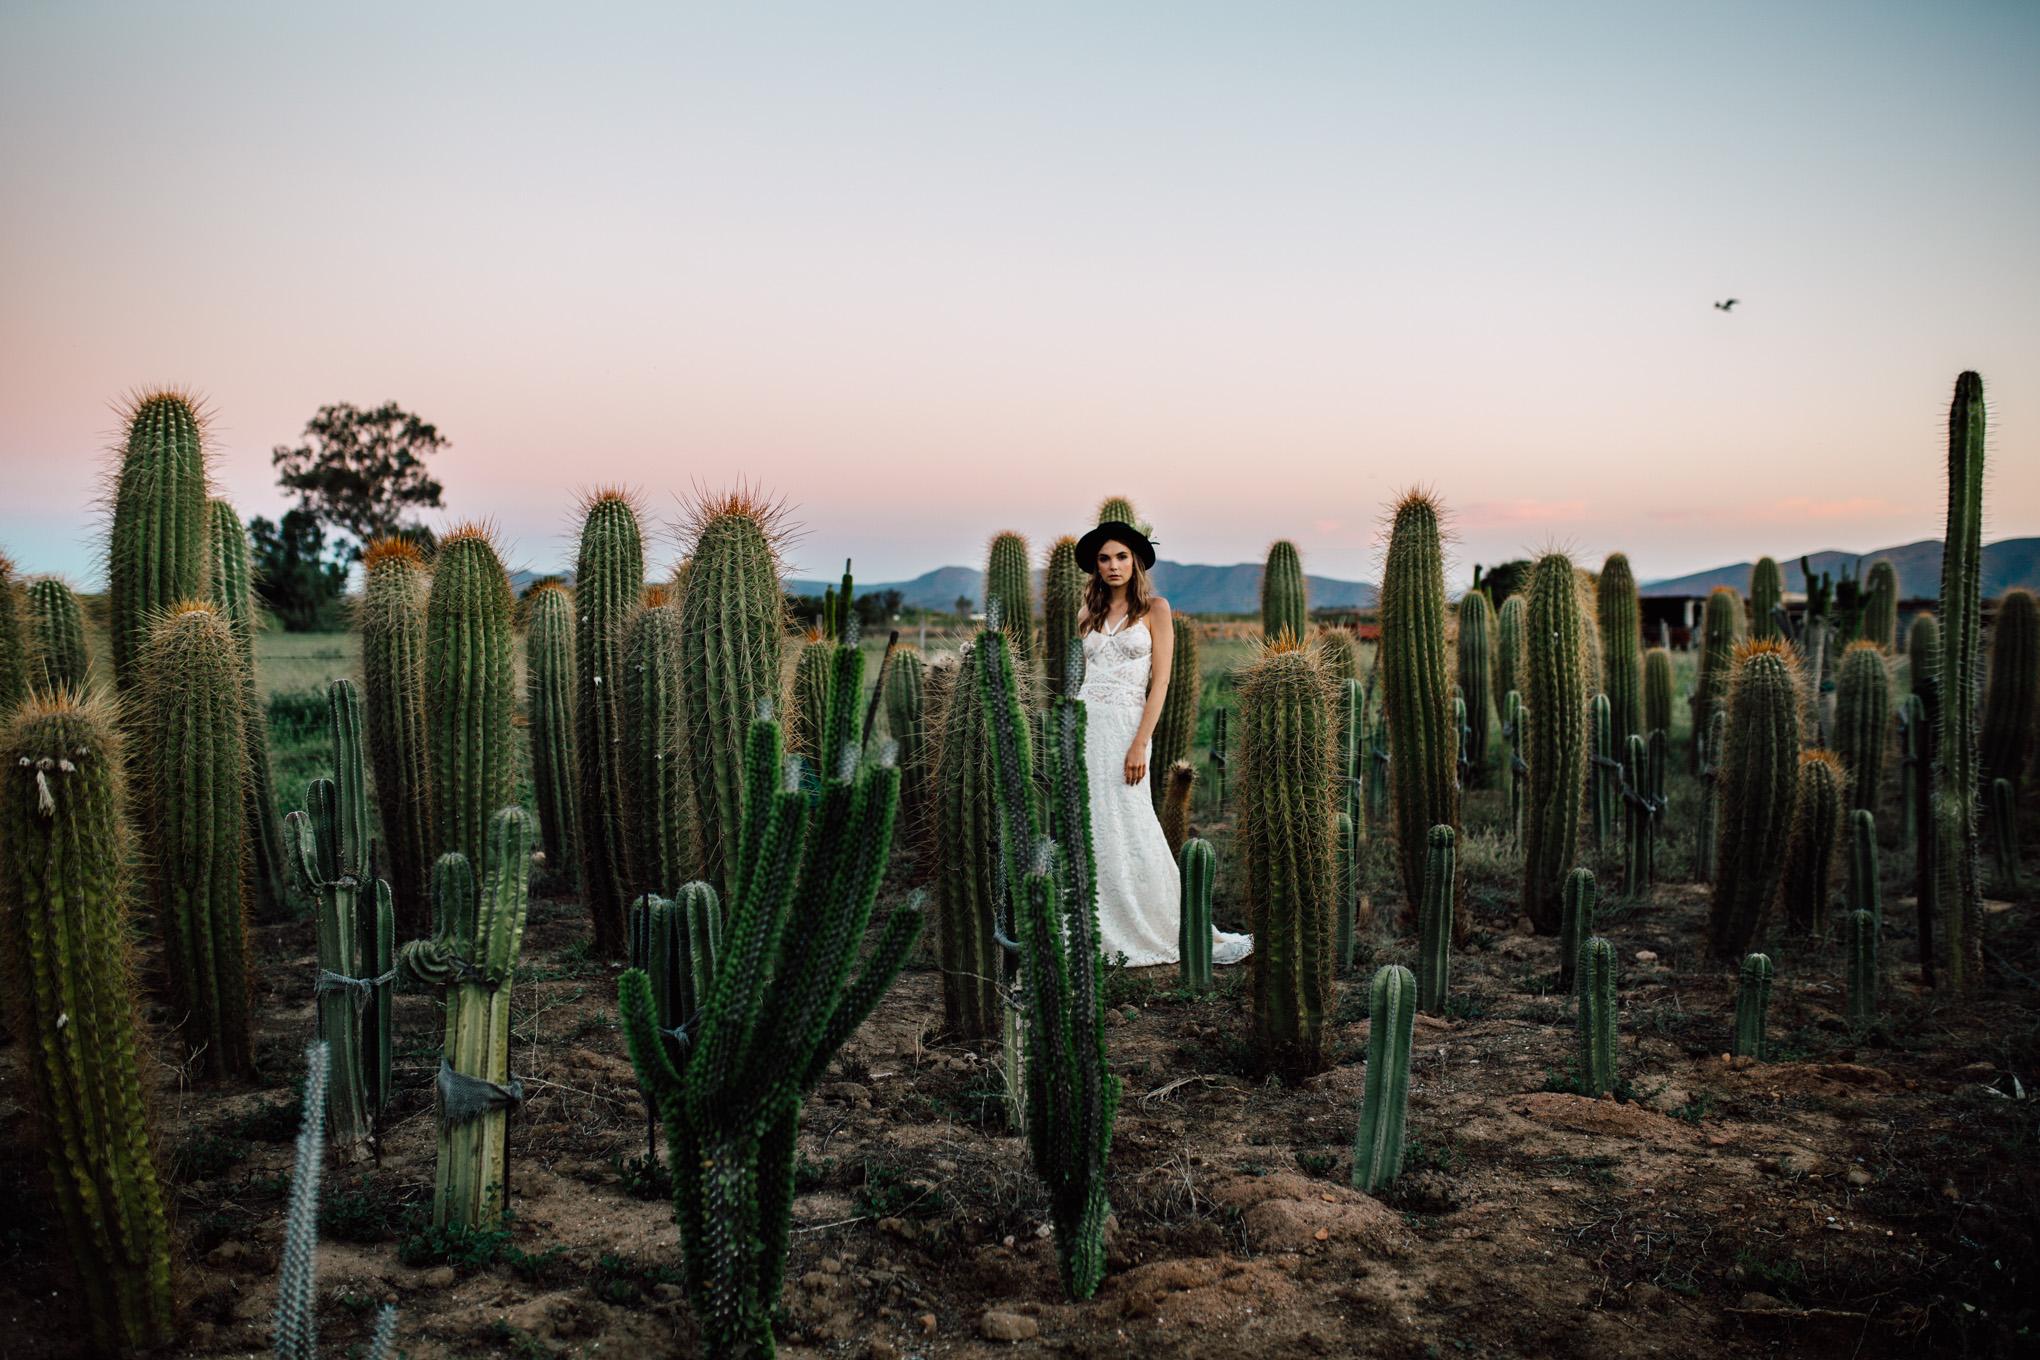 Cape-Town-Pia-Anna-Christian-Wedding-Photography-South-Africa-Bride-Cactus-35.jpg